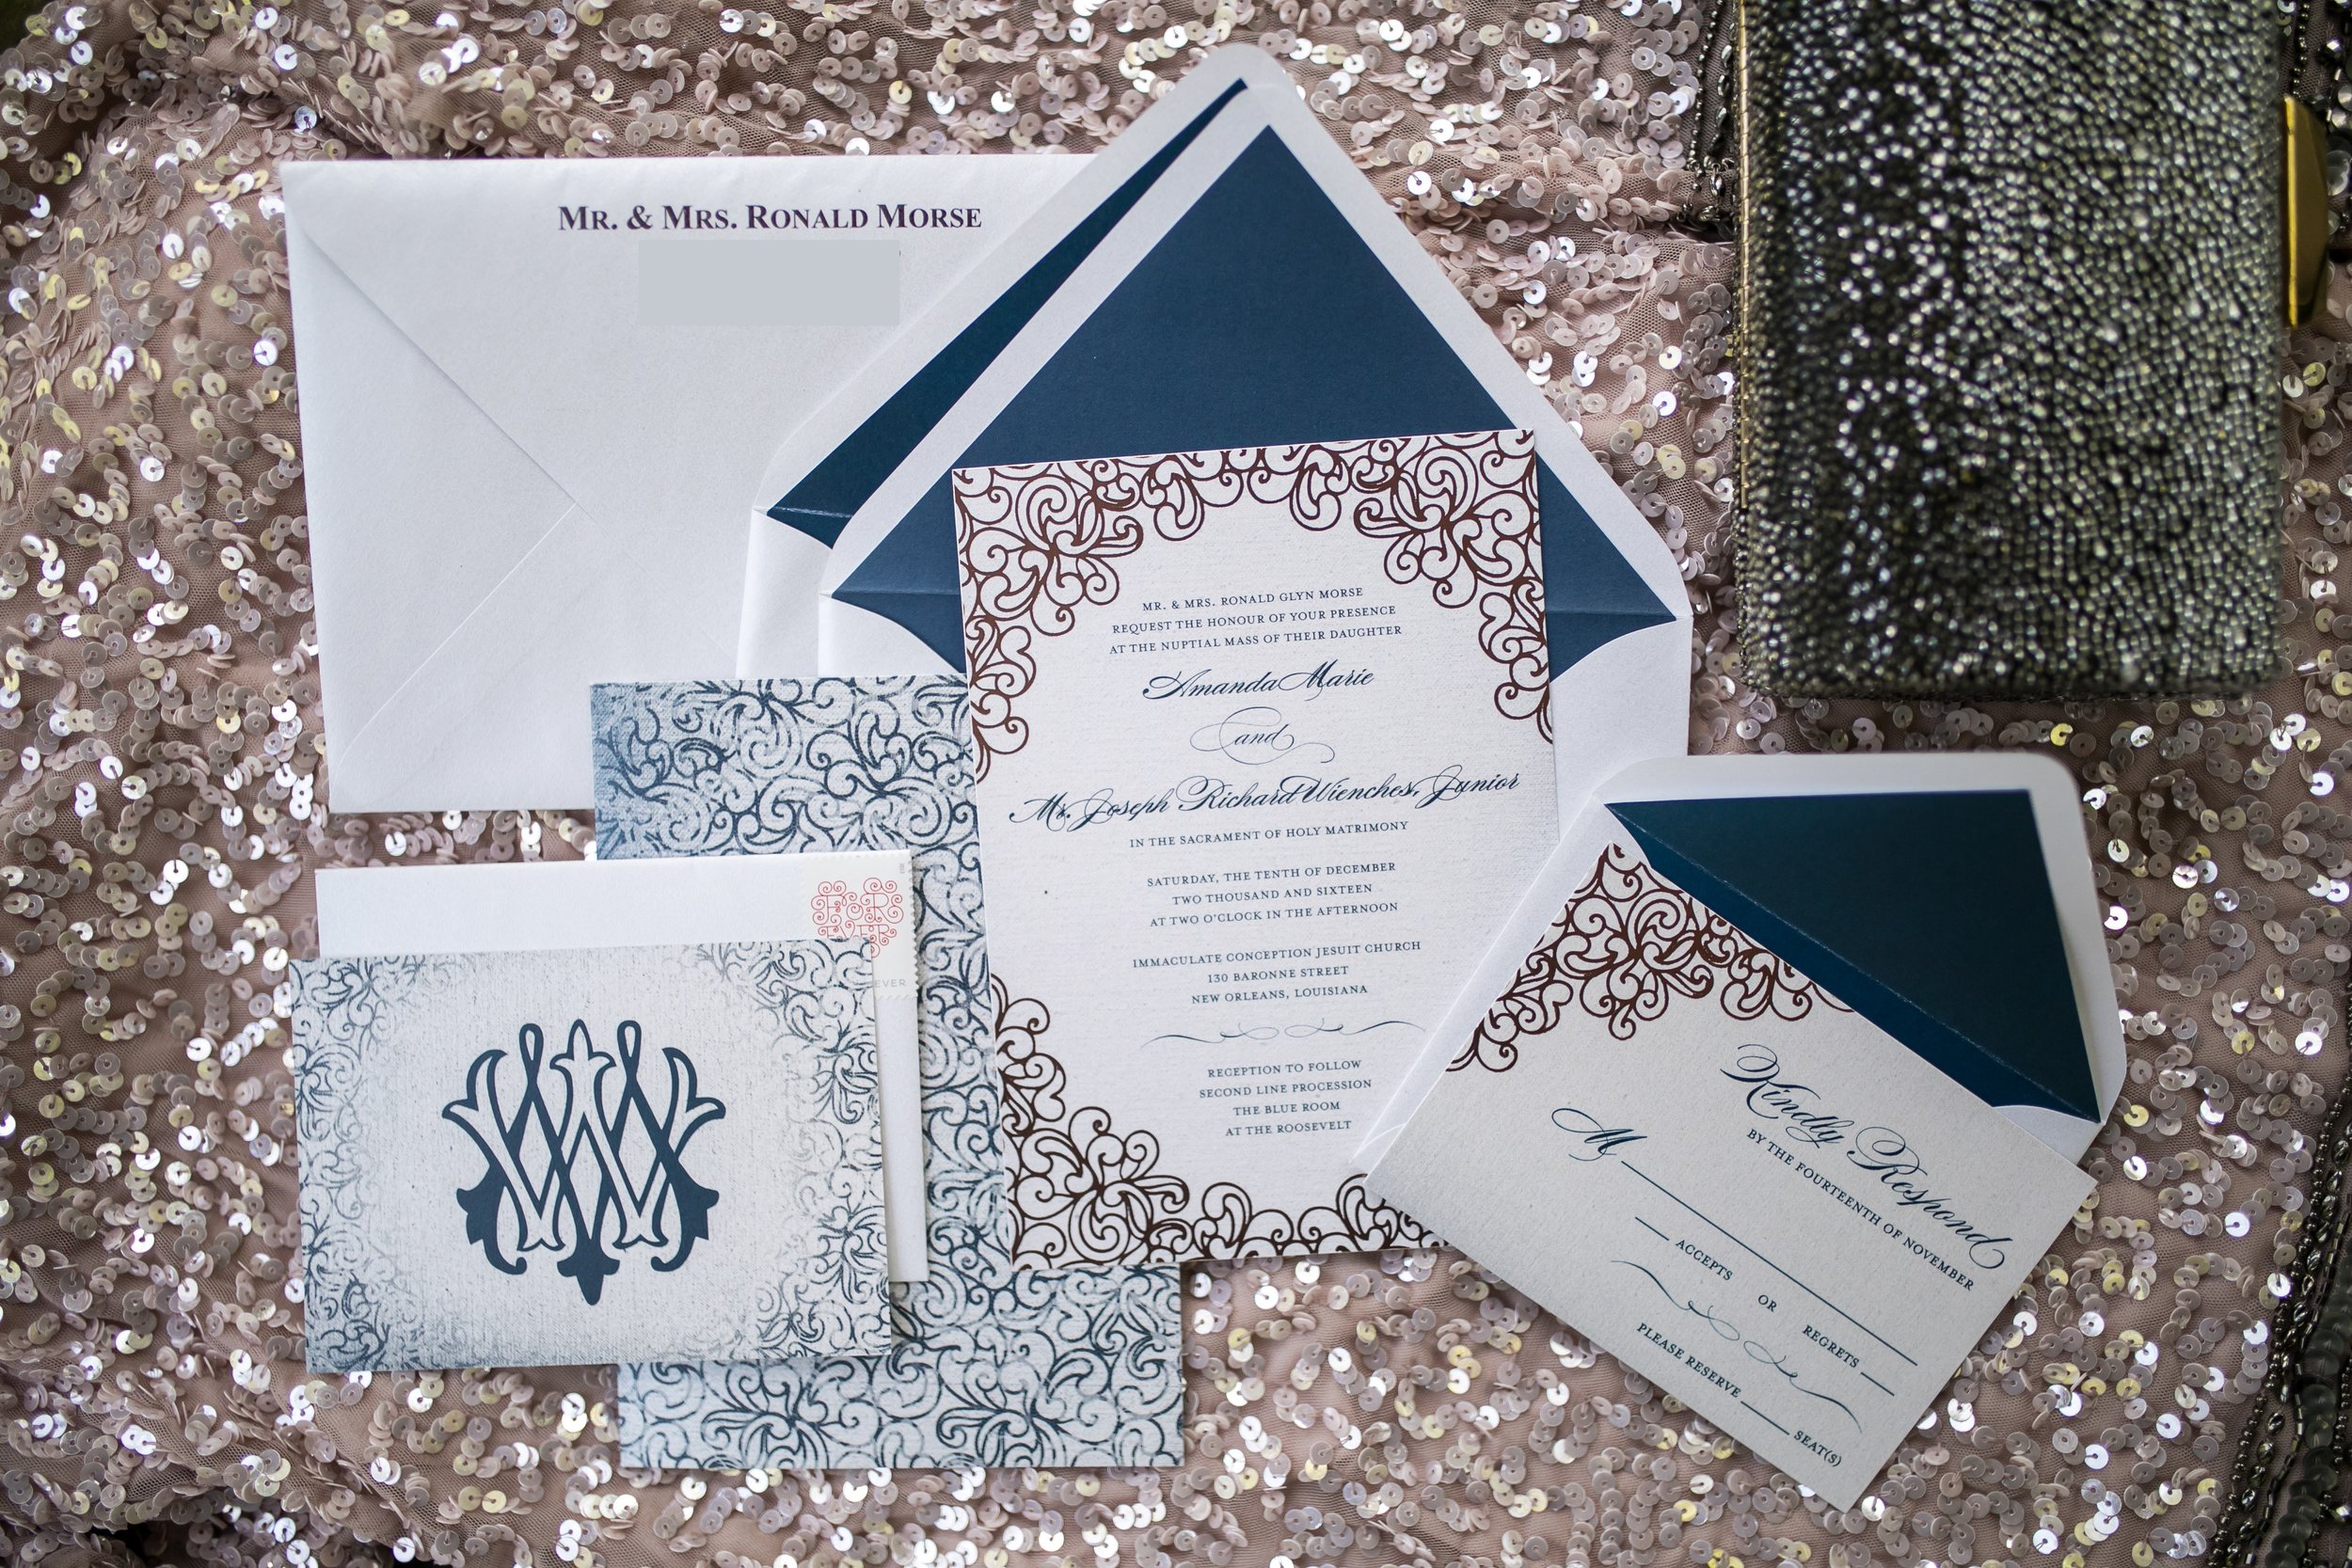 amanda.morse.bridal.stuff.details.blah-13.jpg